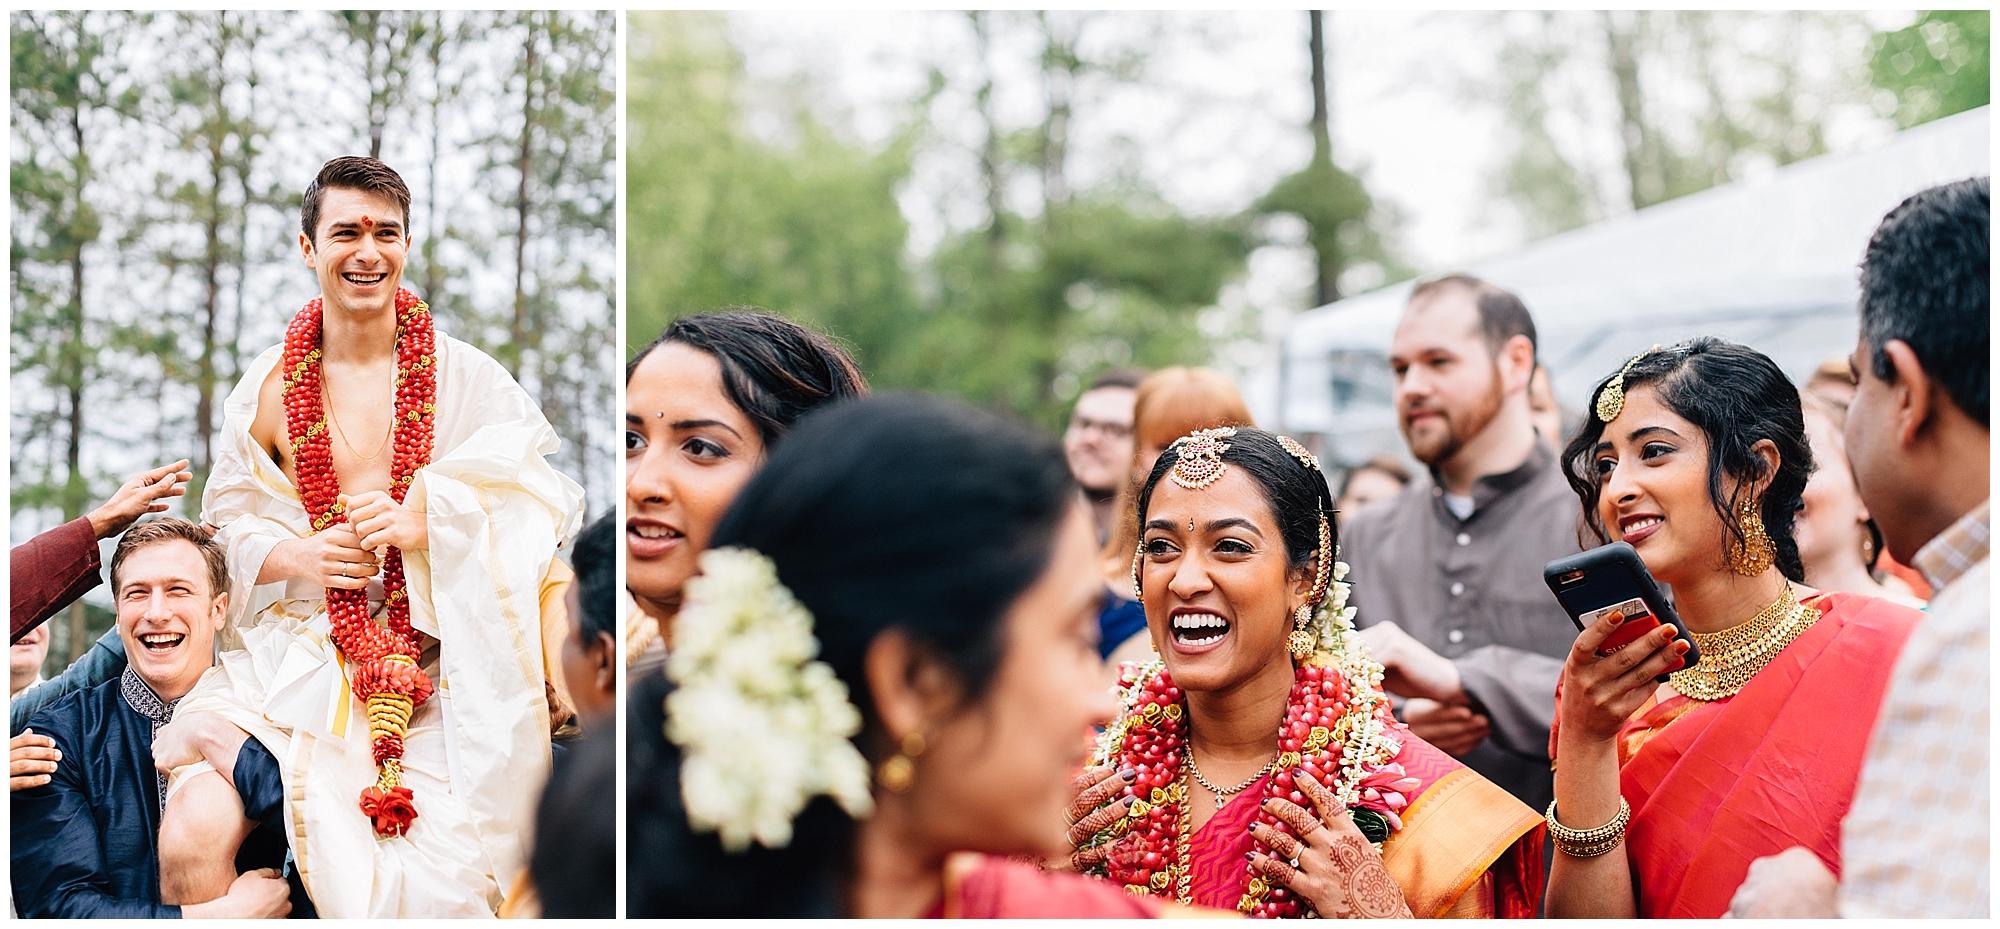 Indian-Wedding-Photographer-Raleigh-24.jpg